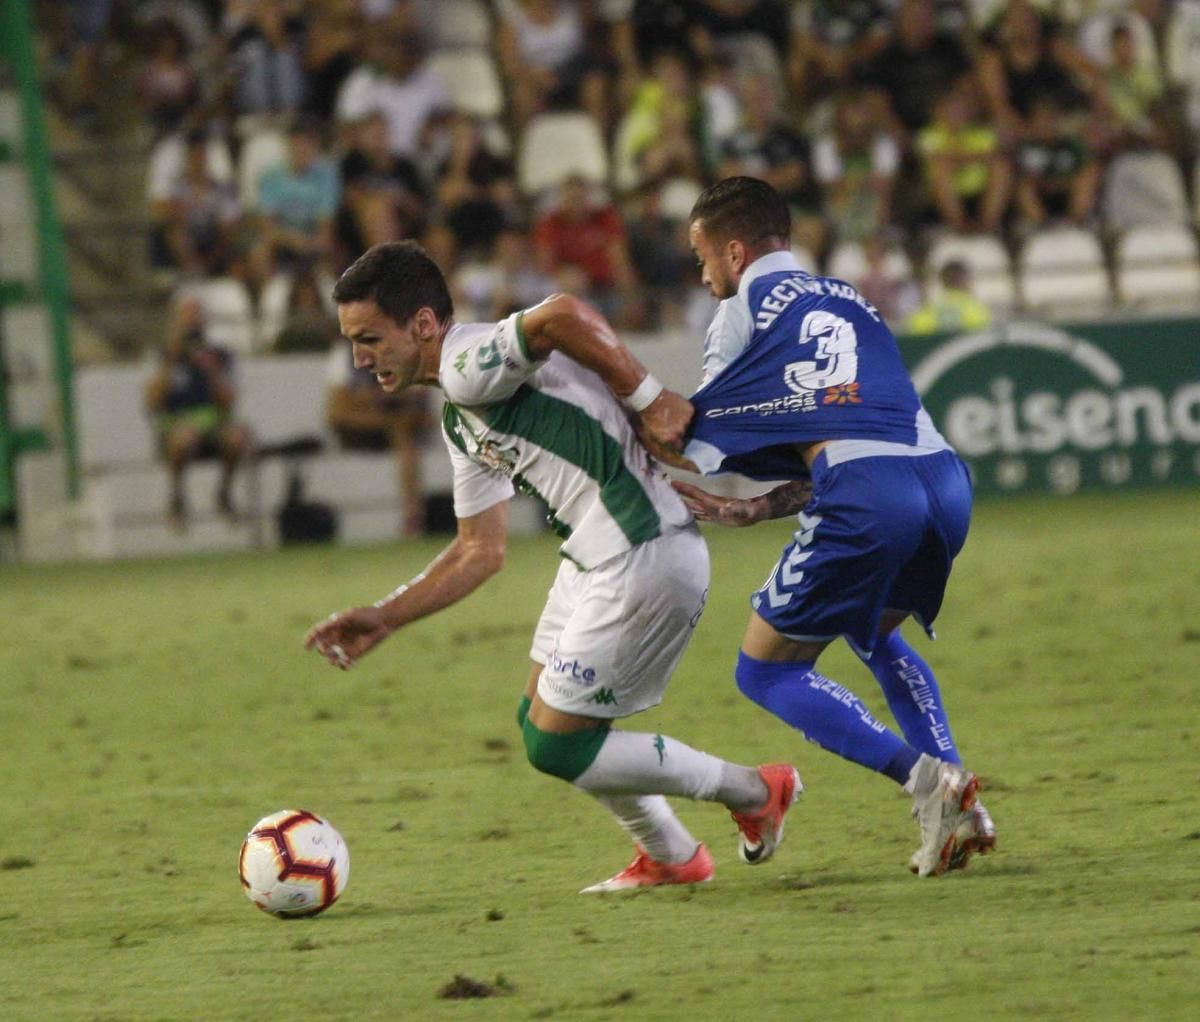 Las imágenes del Córdoba C.F.-Tenerife